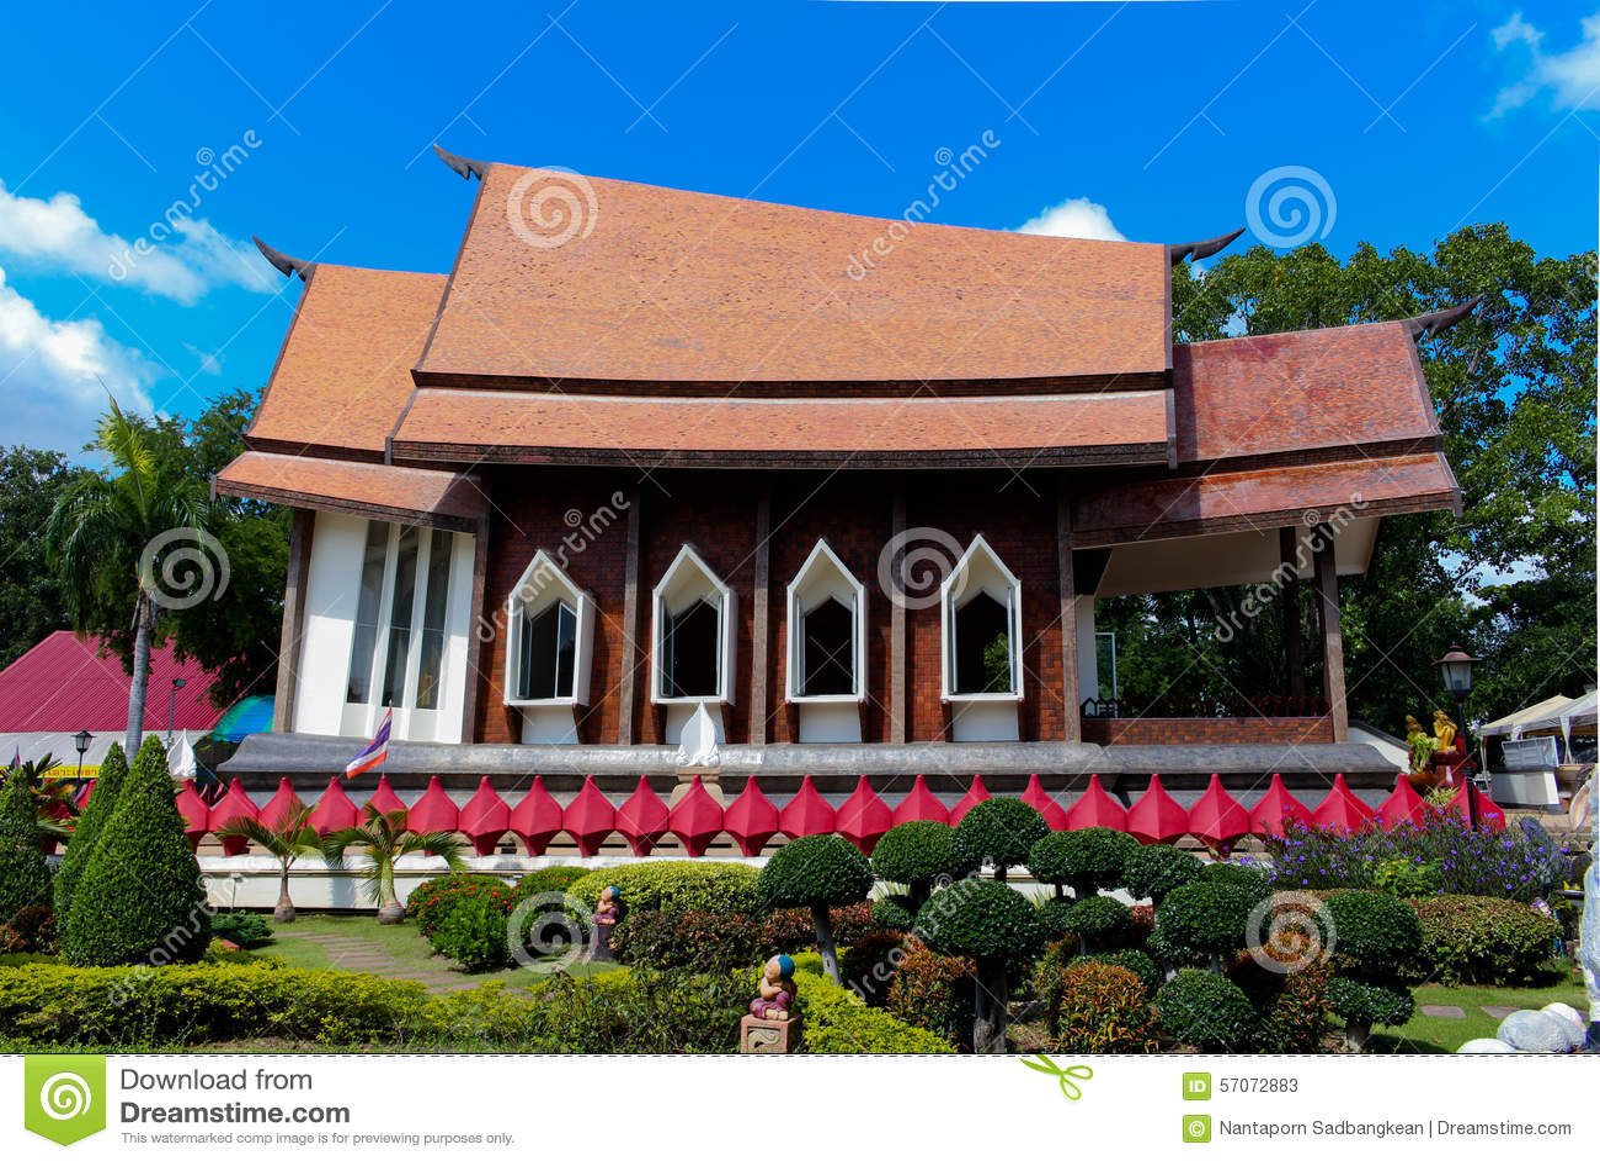 Salaloi van tempel Thaise wat